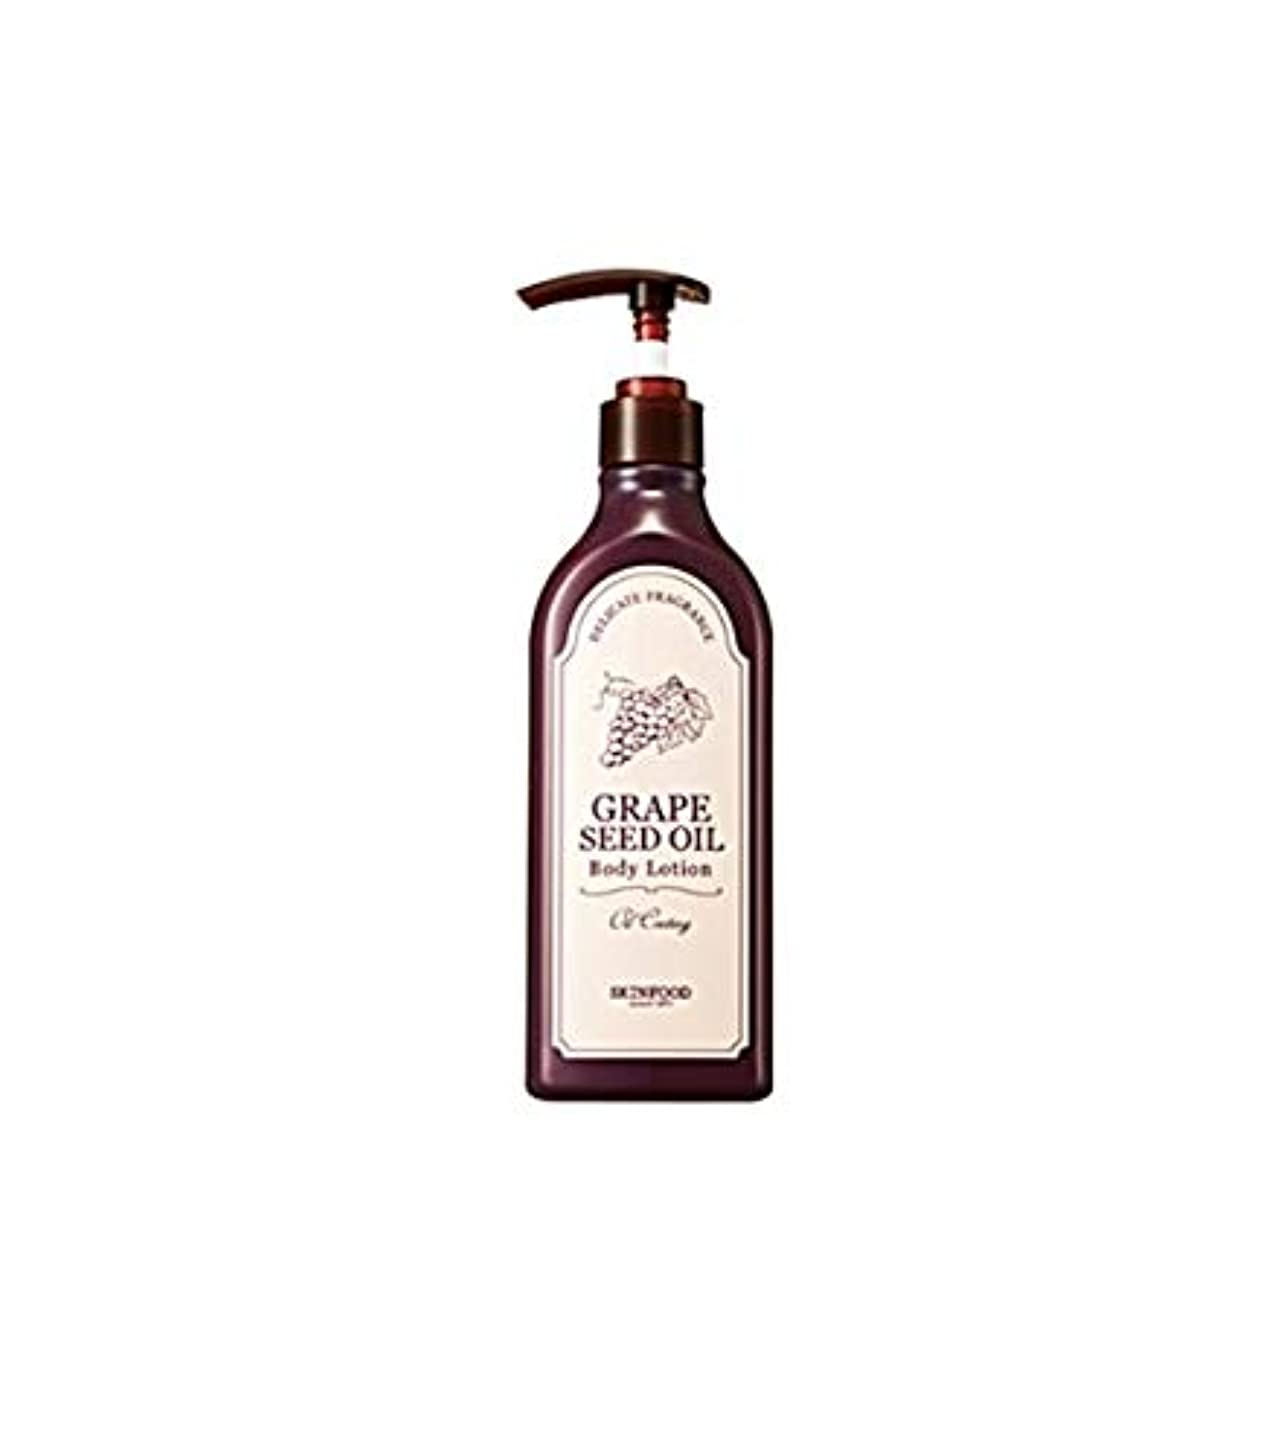 Skinfood グレープシードオイルボディローション/Grape Seed Oil Body Lotion 335 ml [並行輸入品]